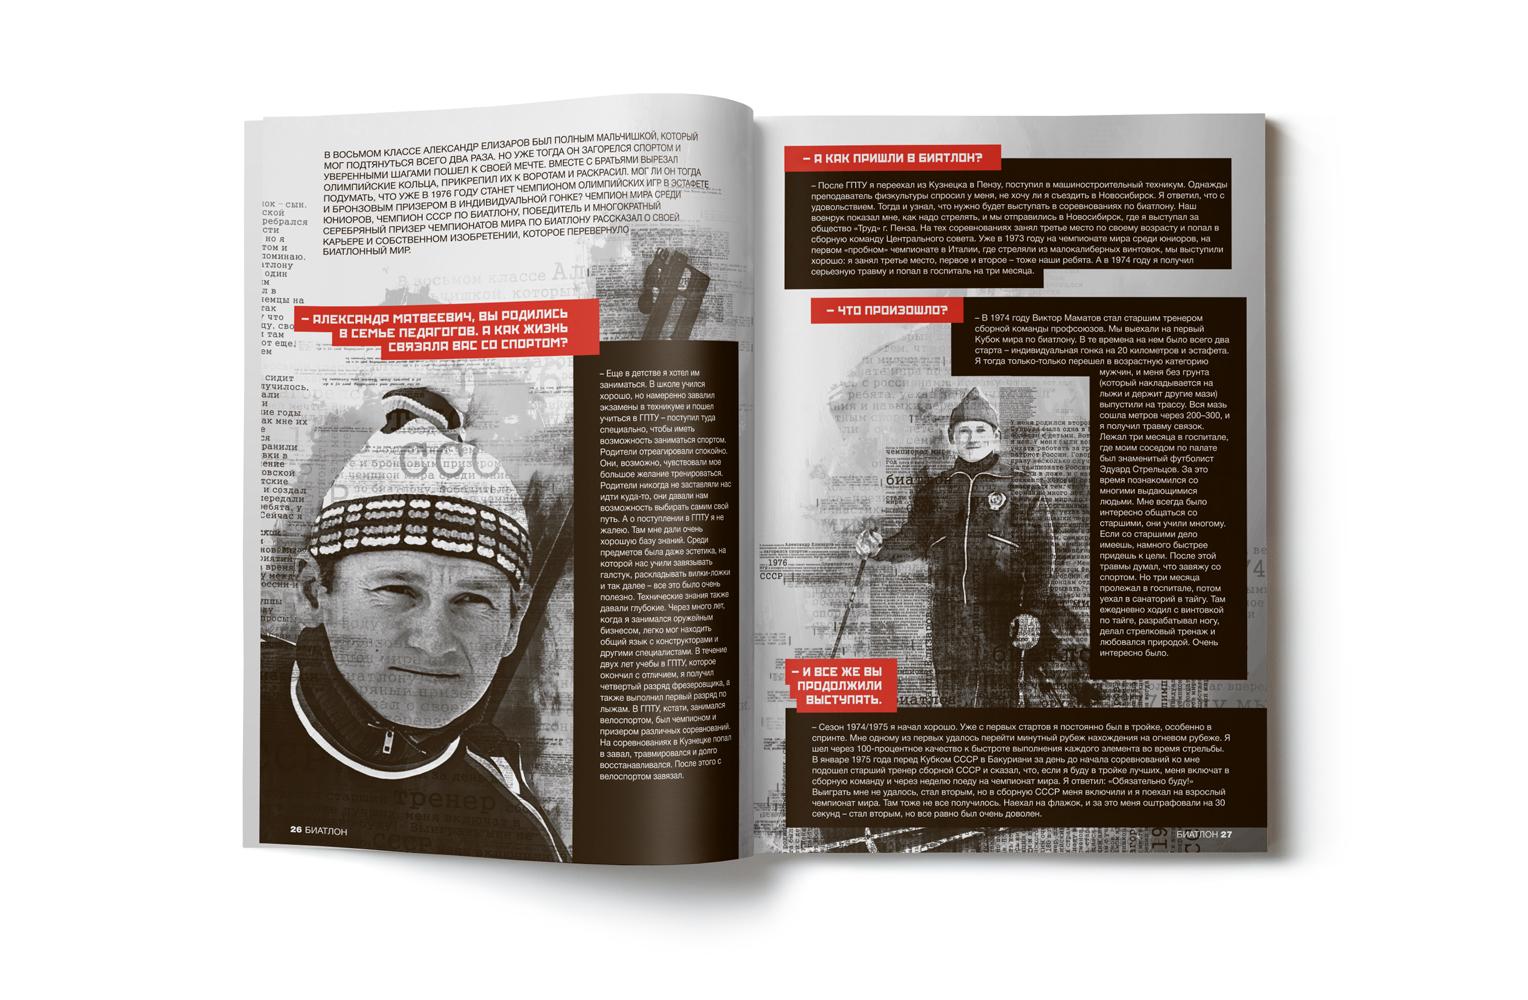 biathlon-magazine-pages-1